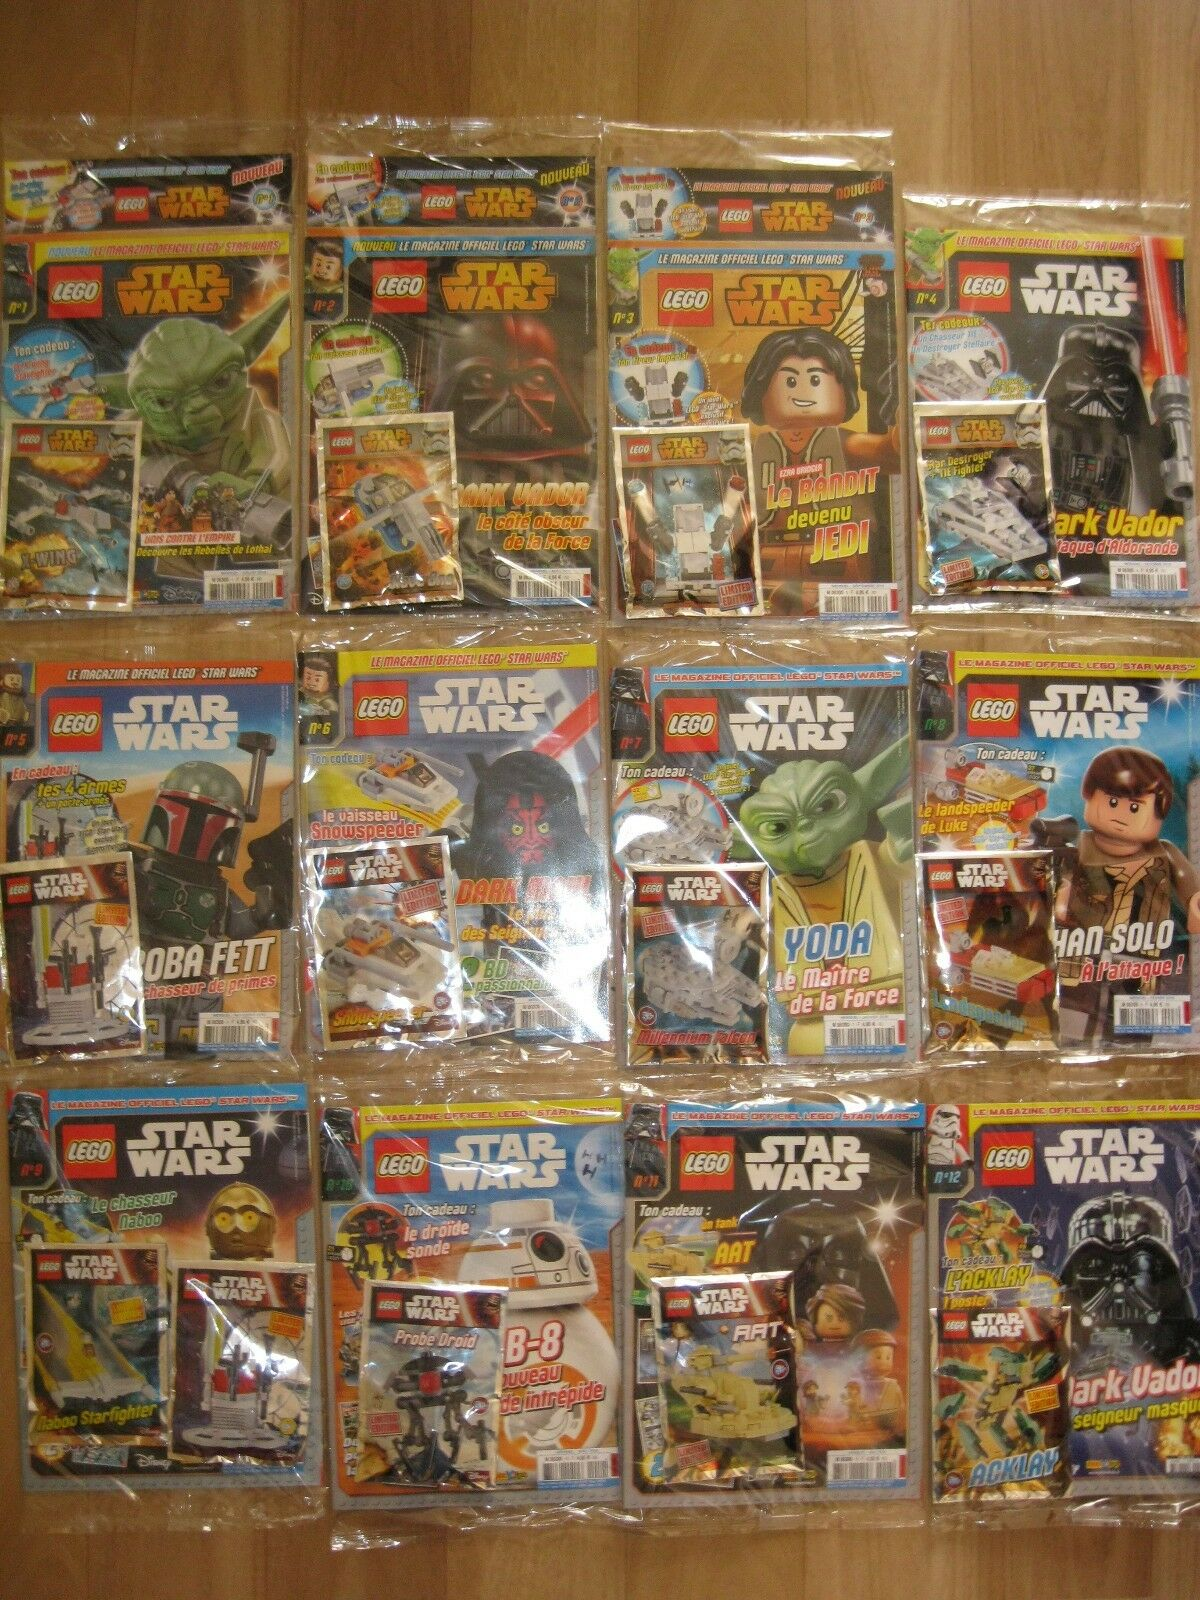 LOT DE 40 MAGAZINES LEGO   STARS WARS    SOUS BLISTER N°1 a 30  5 HSN°1 a N°5